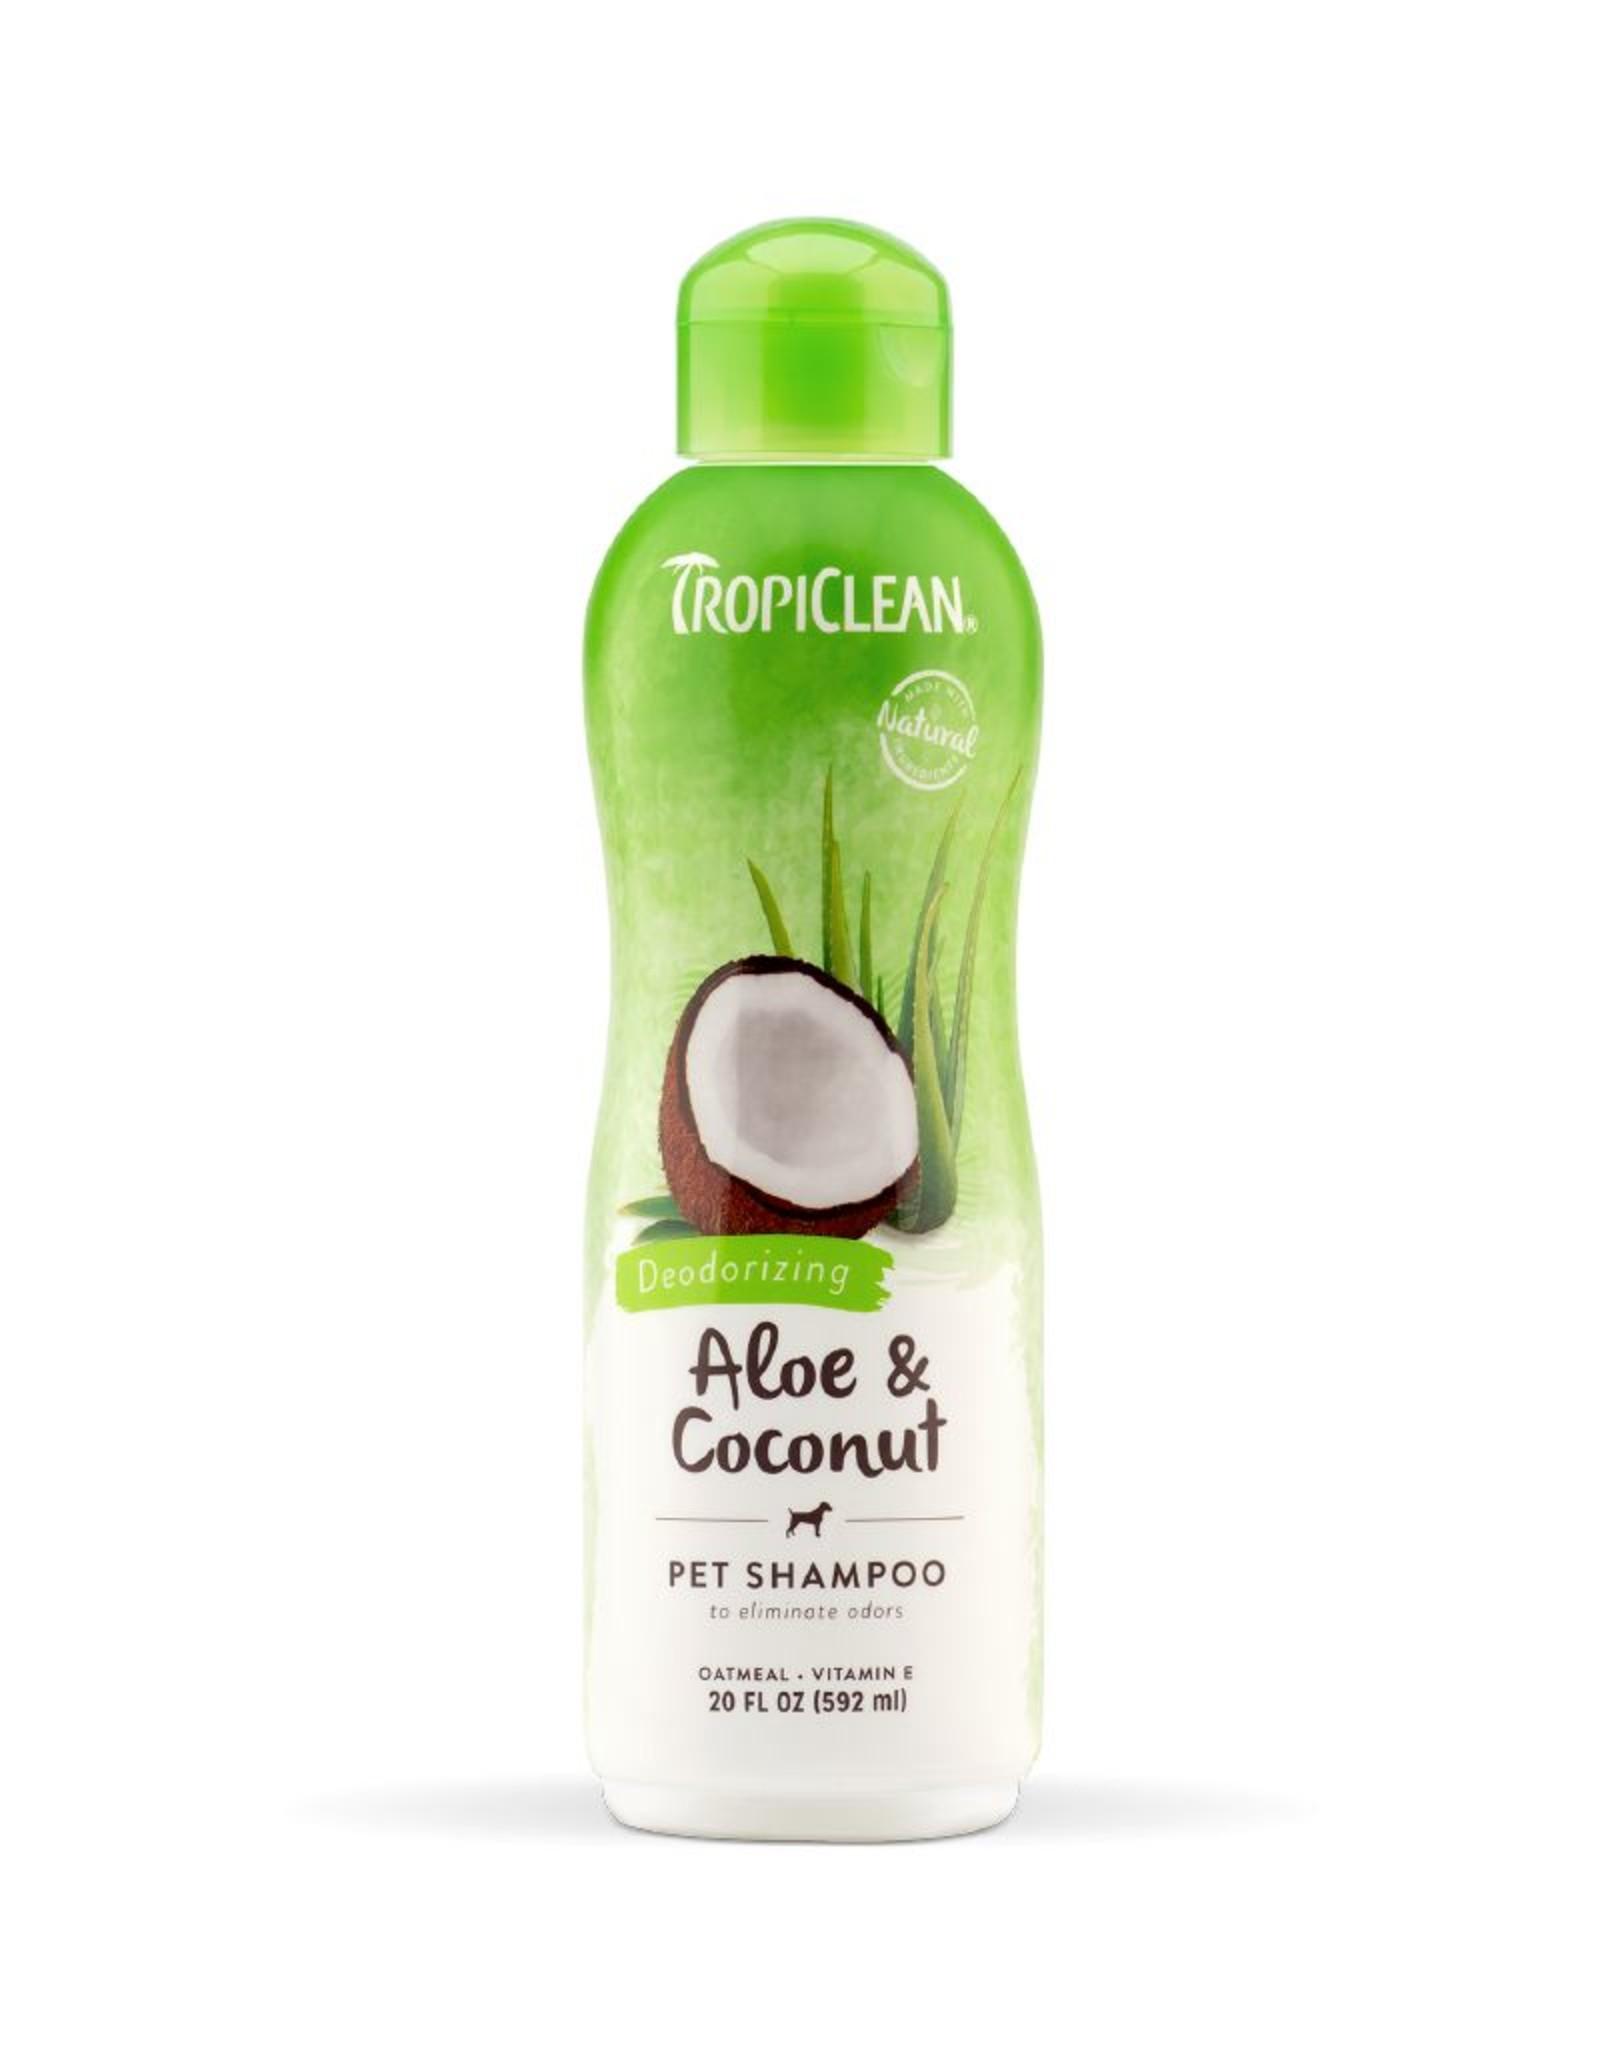 TROPICLEAN TropiClean | Aloe & Coconut Pet Shampoo